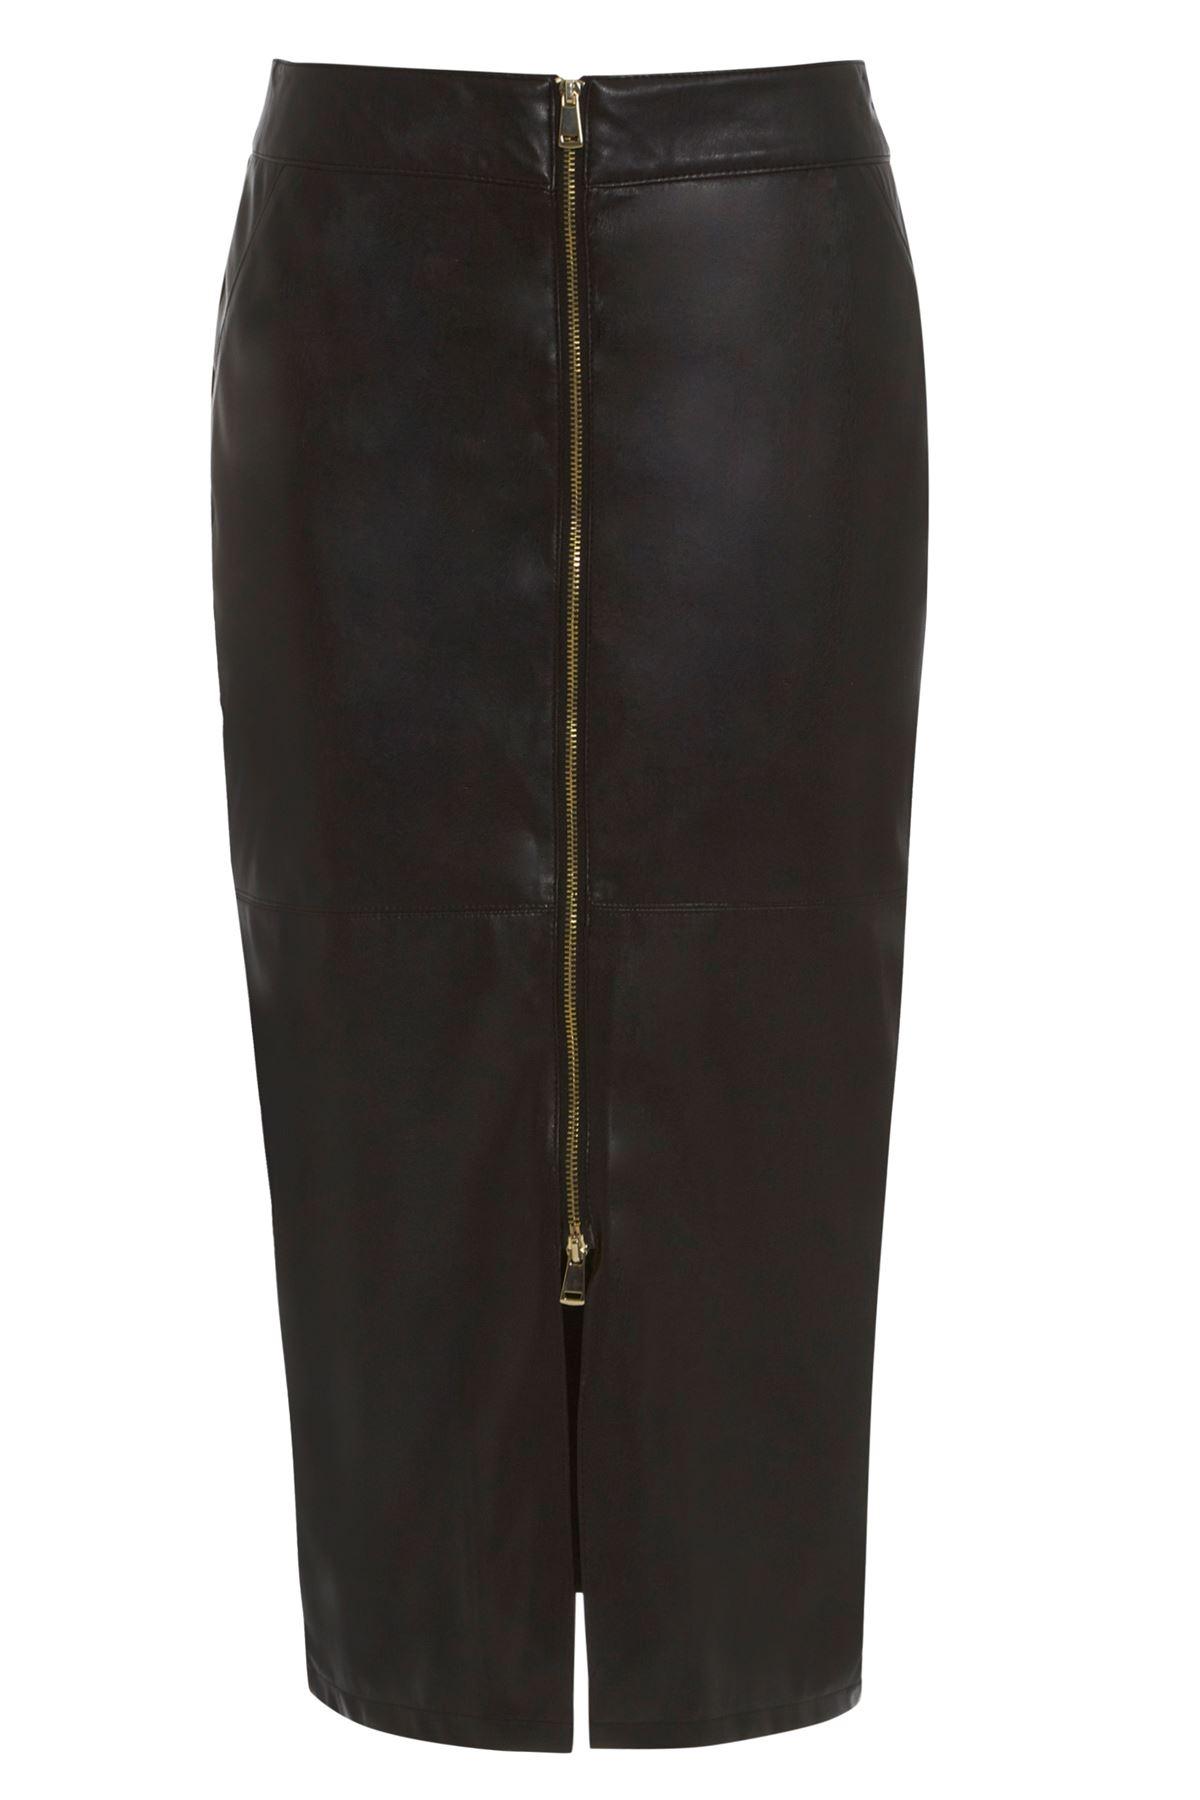 ex ri black leather look zip front pencil skirt ebay